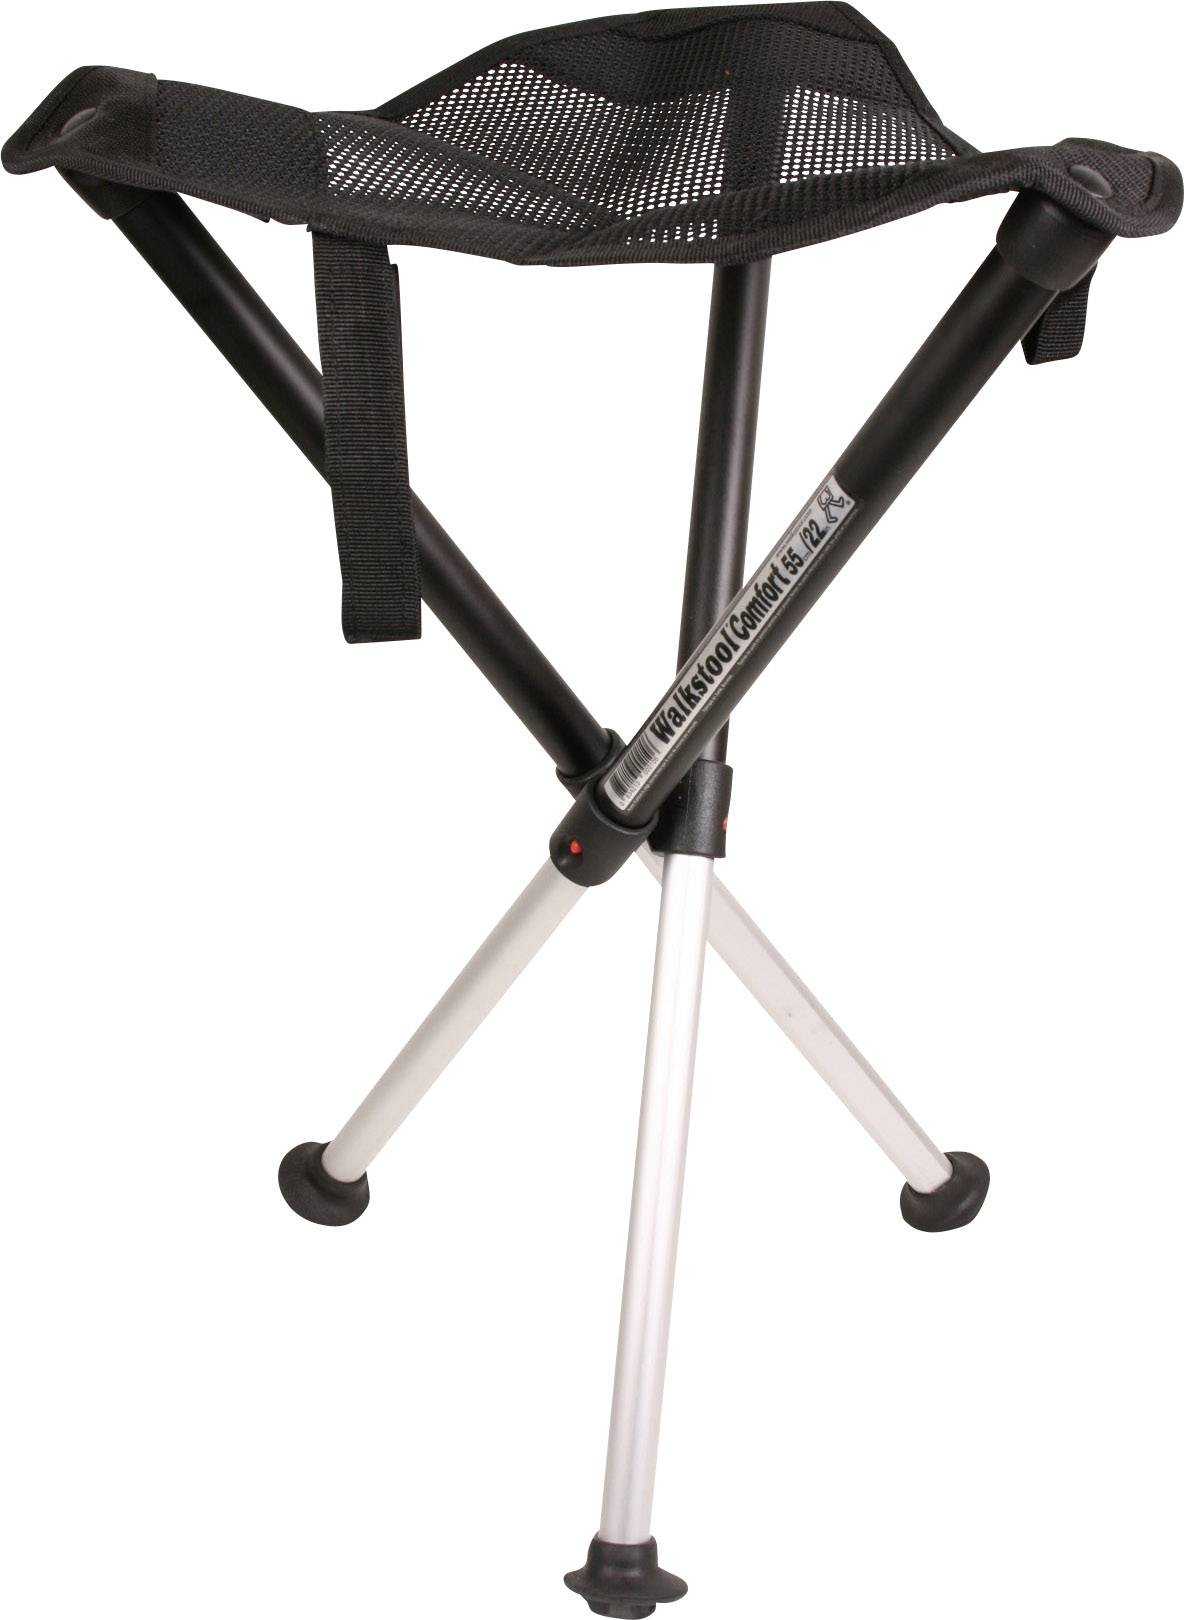 Sensational Folding Chair Walkstool Comfort Xl Black Silver 63547 Squirreltailoven Fun Painted Chair Ideas Images Squirreltailovenorg